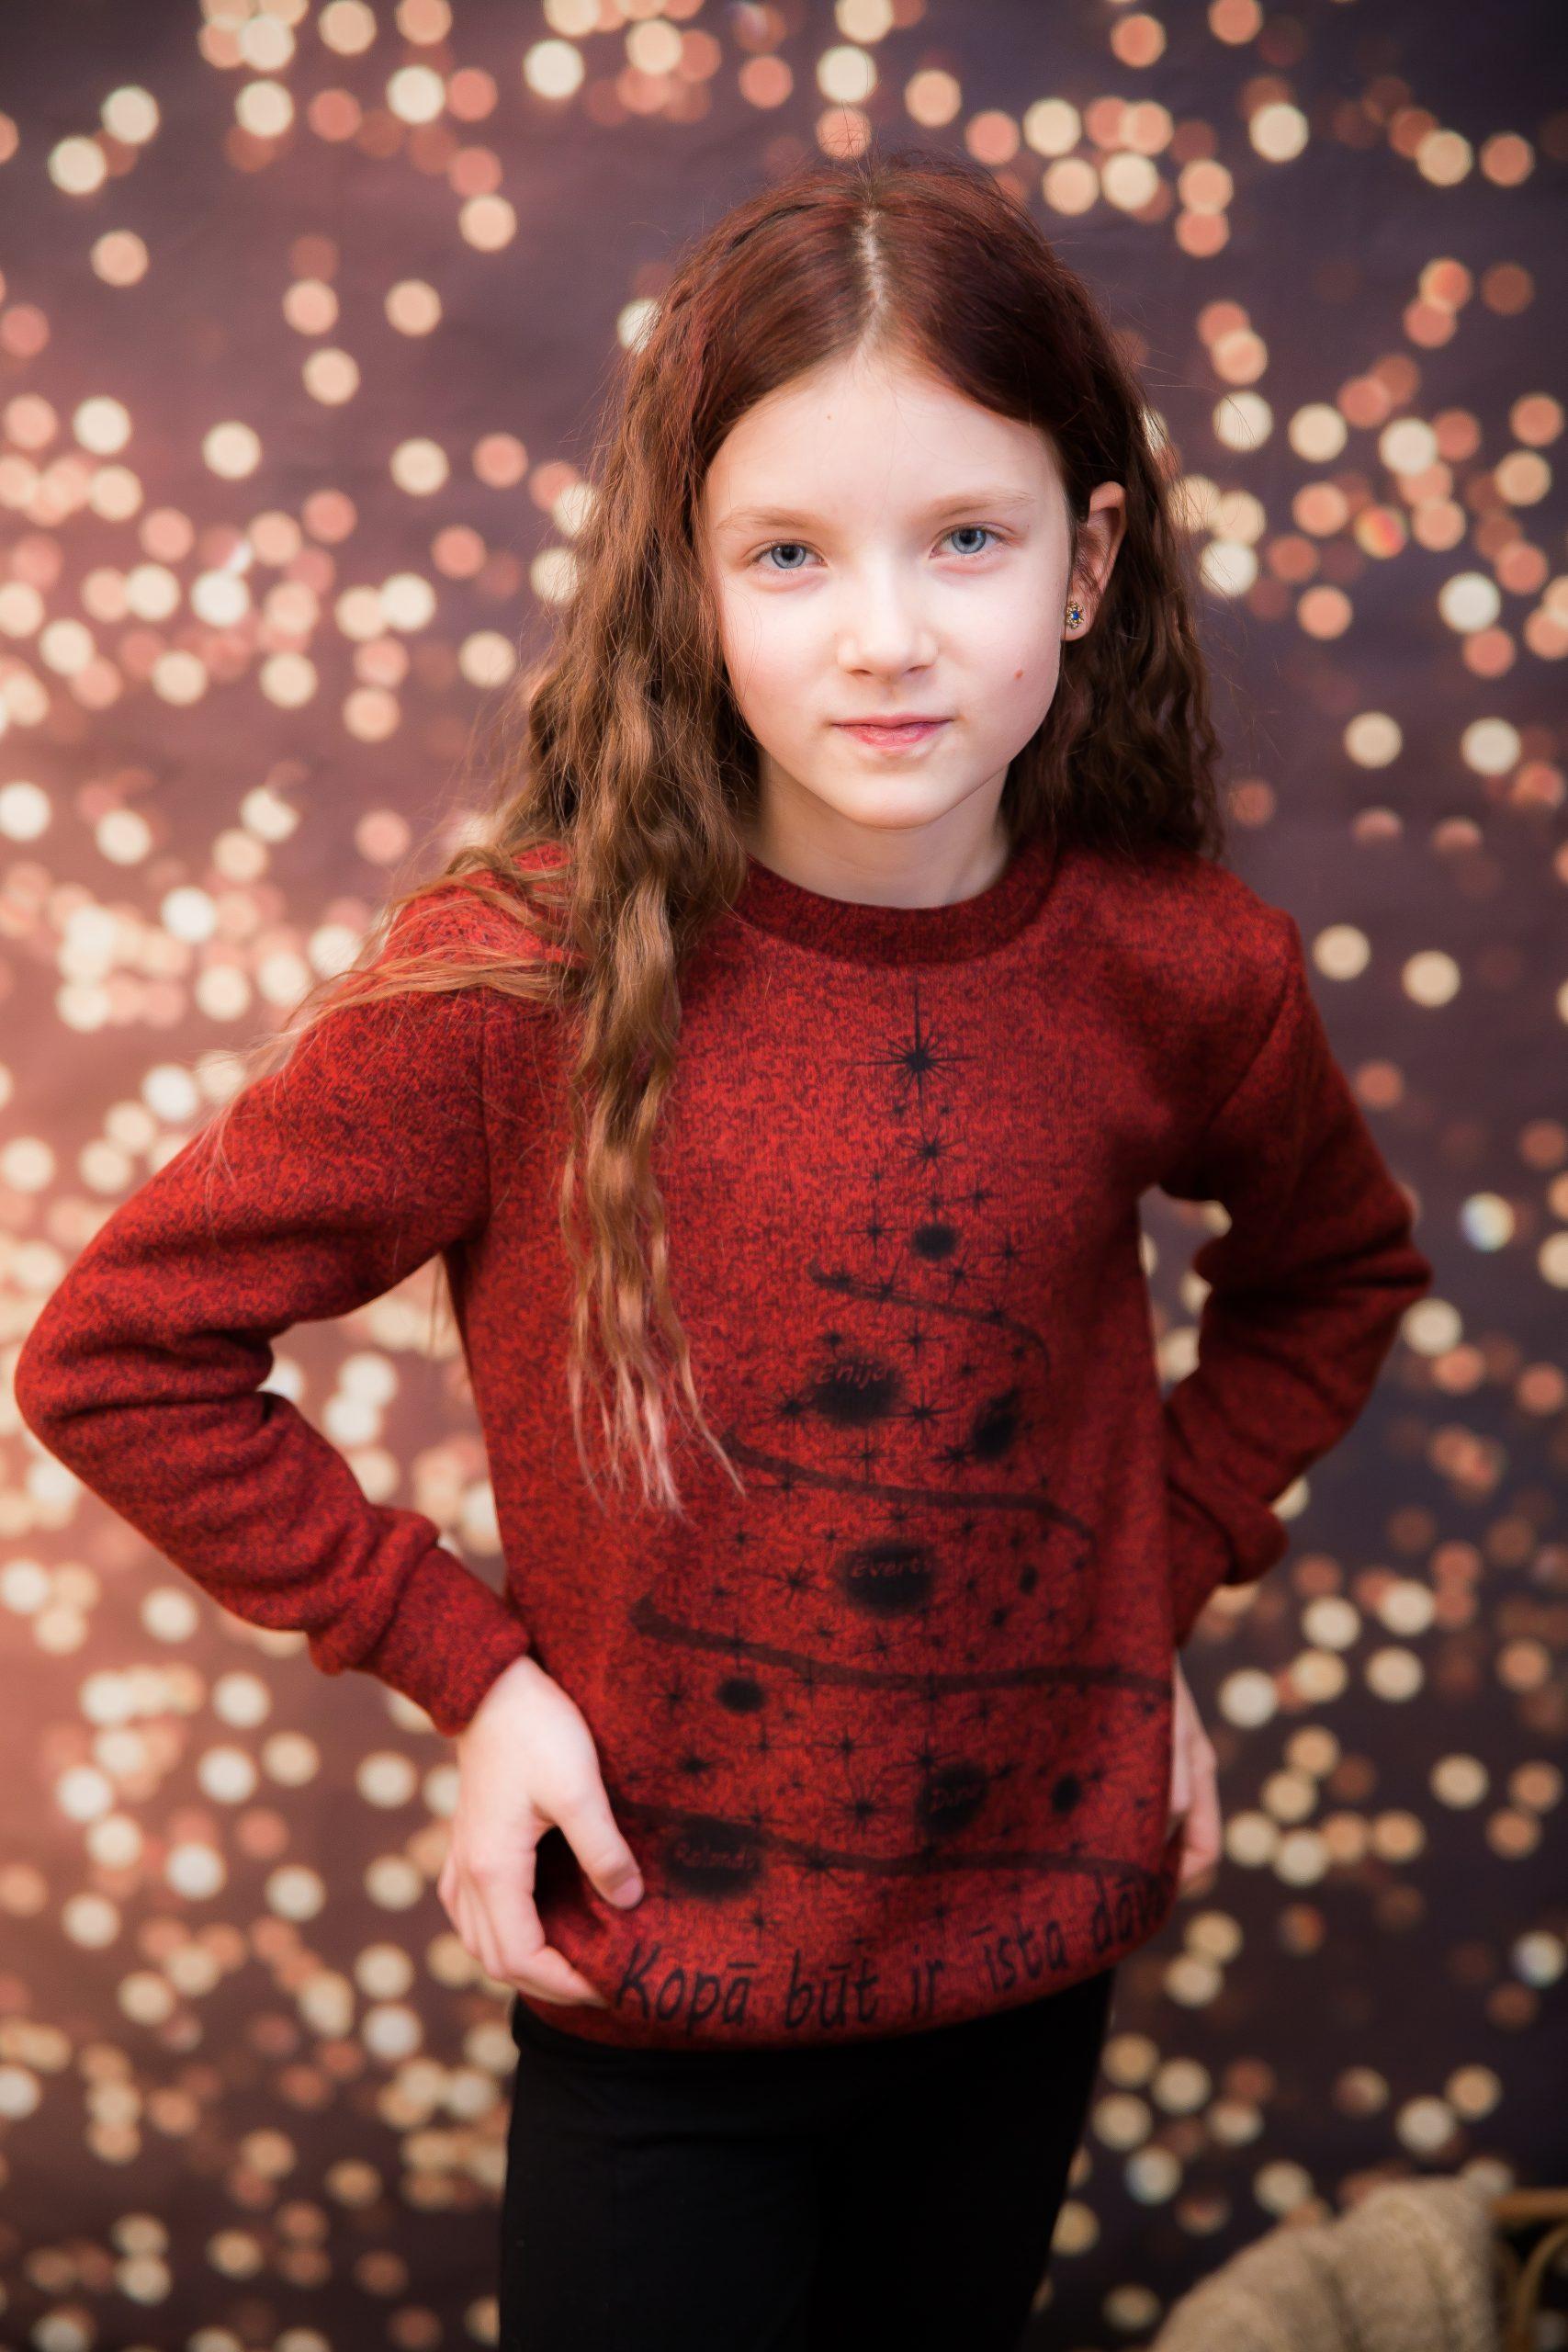 divendi personalized sweater